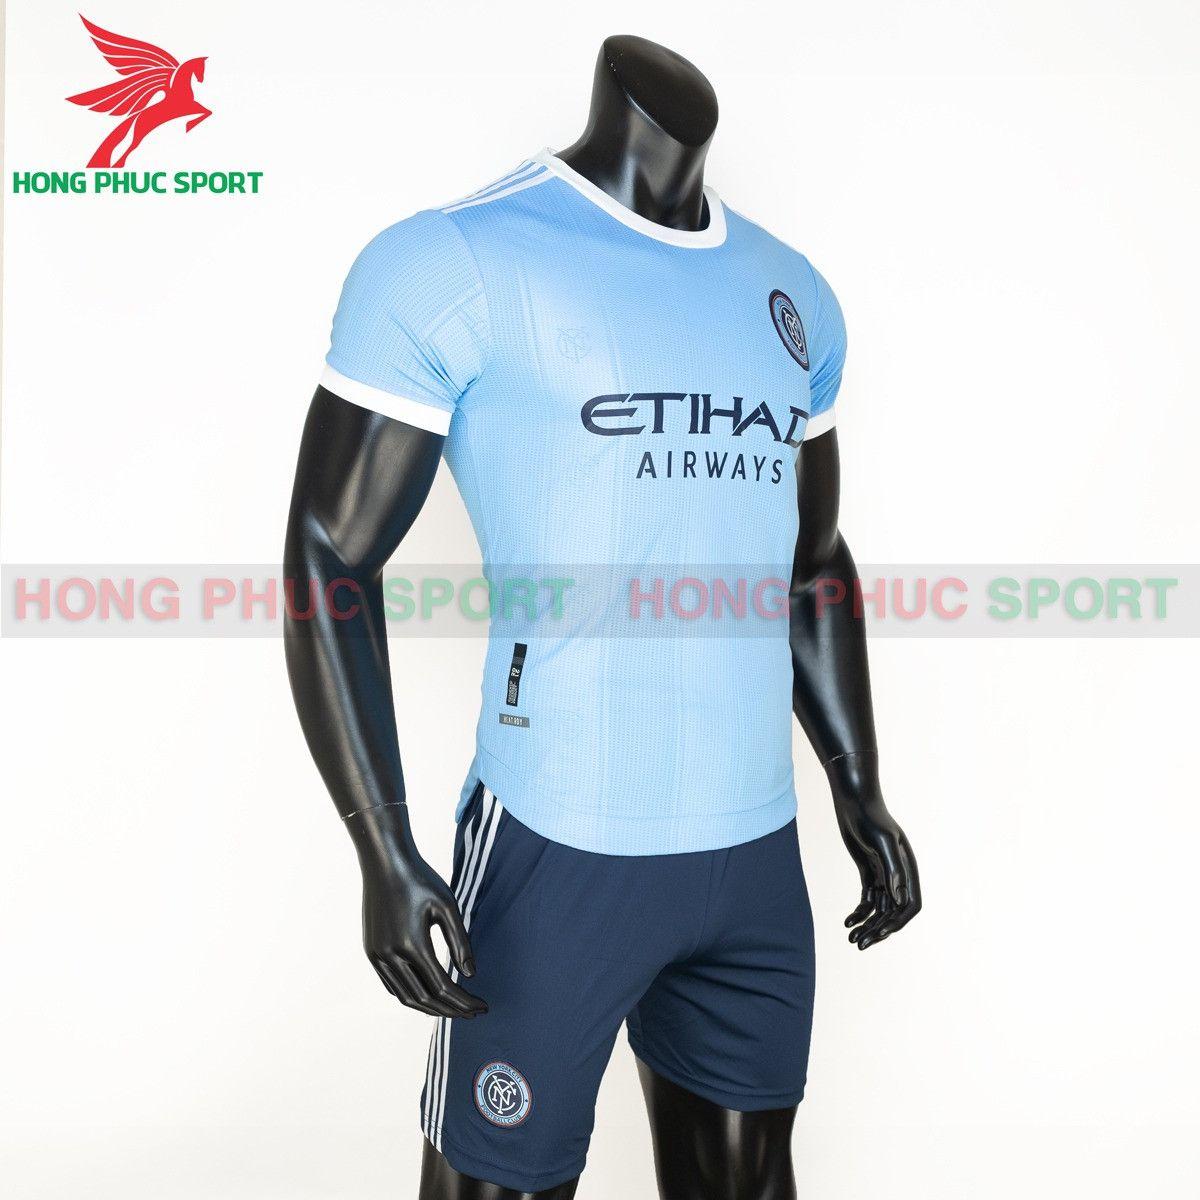 https://cdn.hongphucsport.com/unsafe/s4.shopbay.vn/files/285/ao-dau-new-york-city-2021-2022-san-nha-thailand-3-614add1422b98.jpg